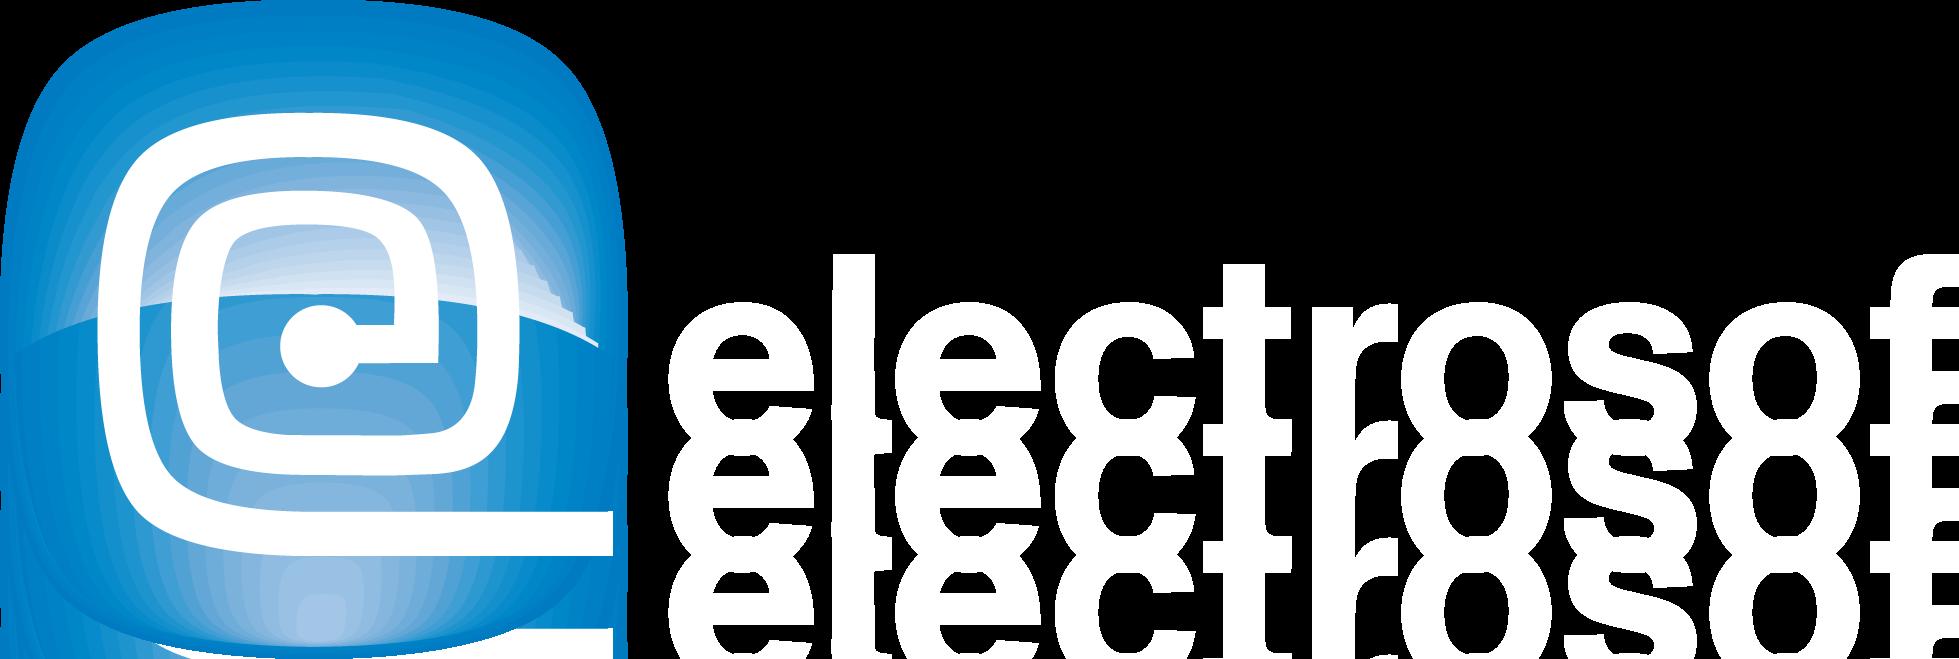 Electrosof